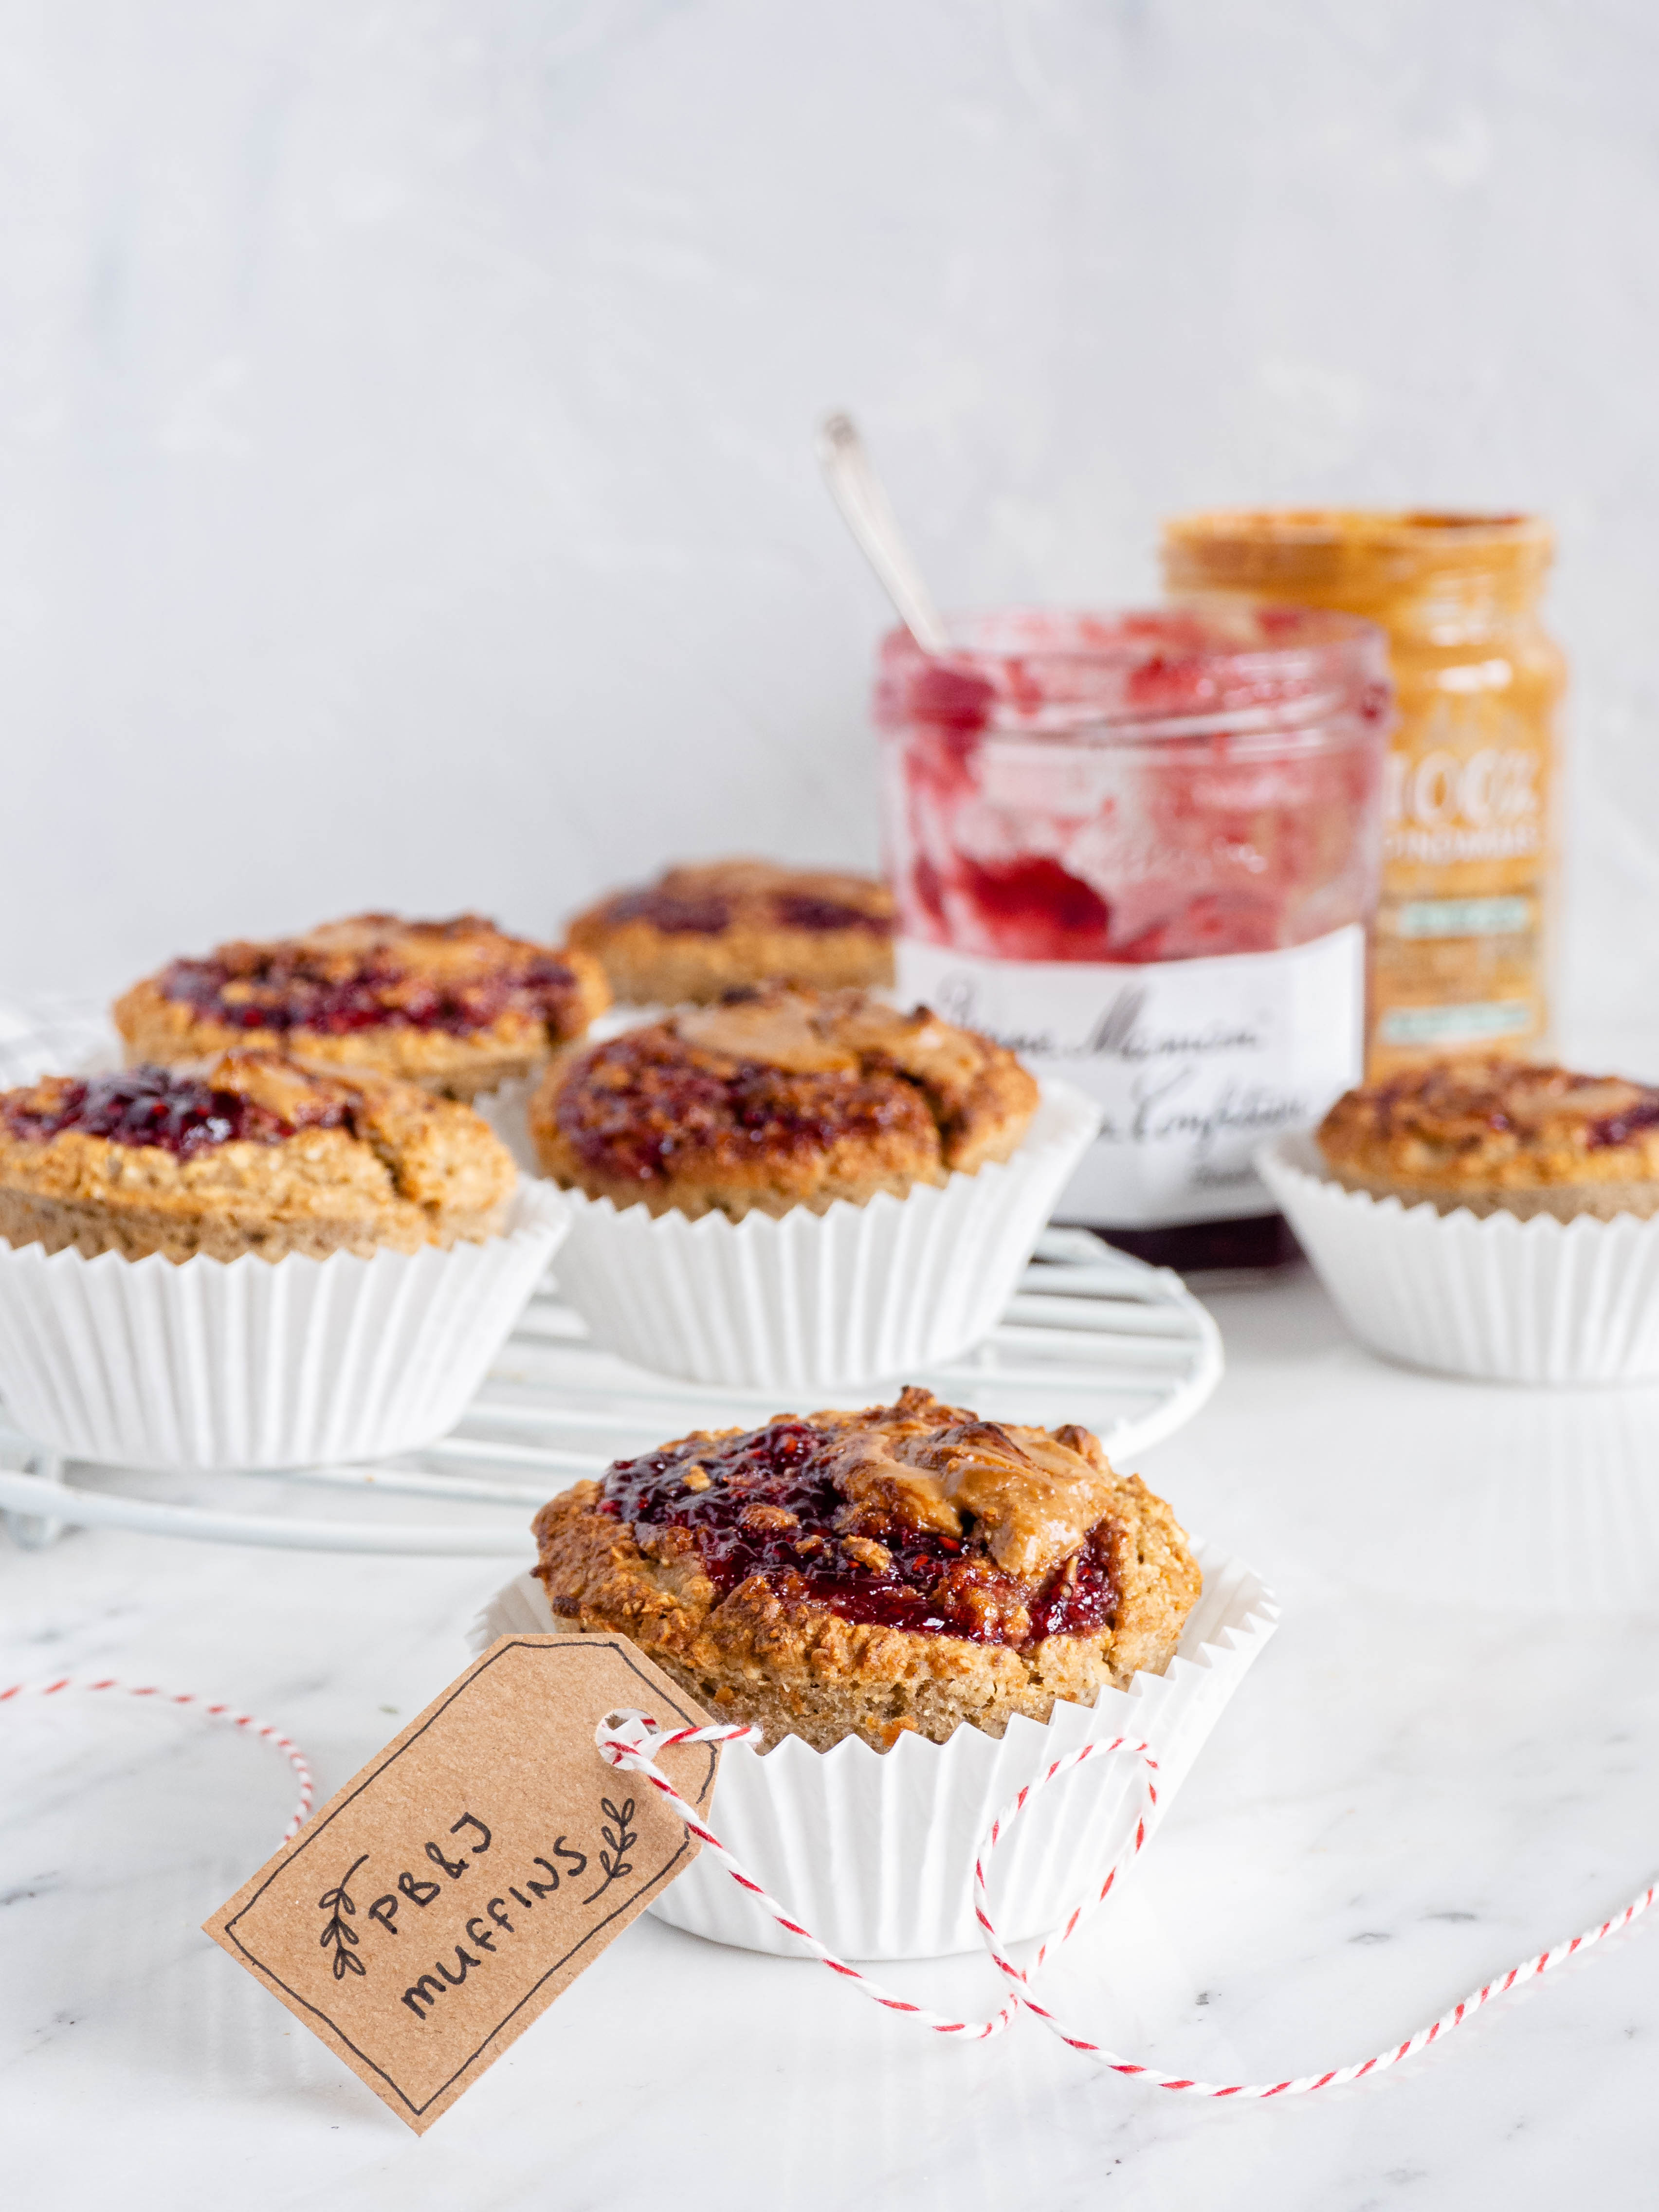 vegan peanutbutter jelly muffins